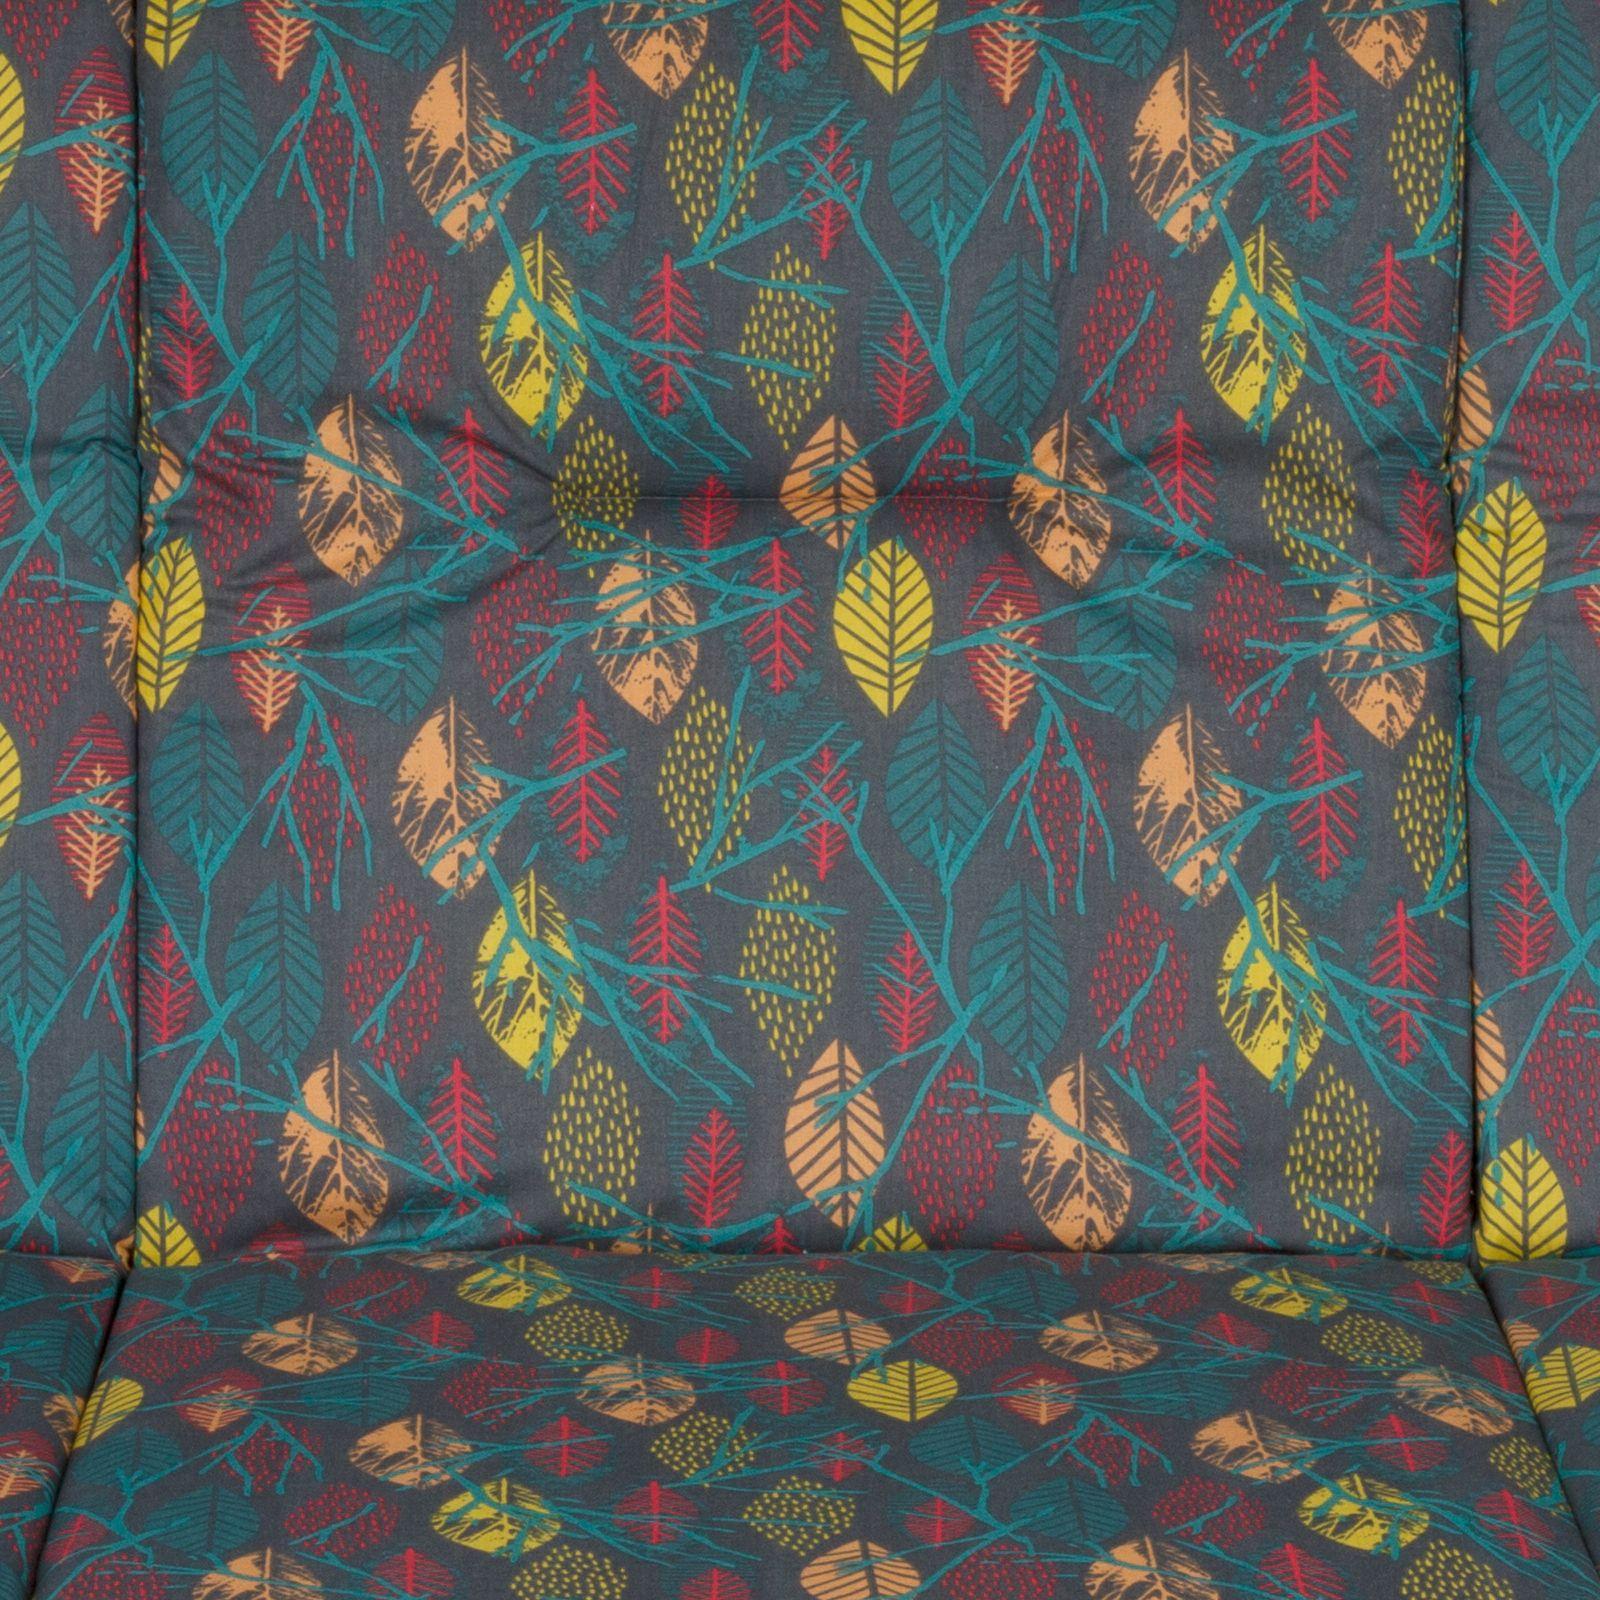 Profilowane poduszki na huśtawkę 180 cm Rimini / Venezia (Bresso) G042-21PB PATIO